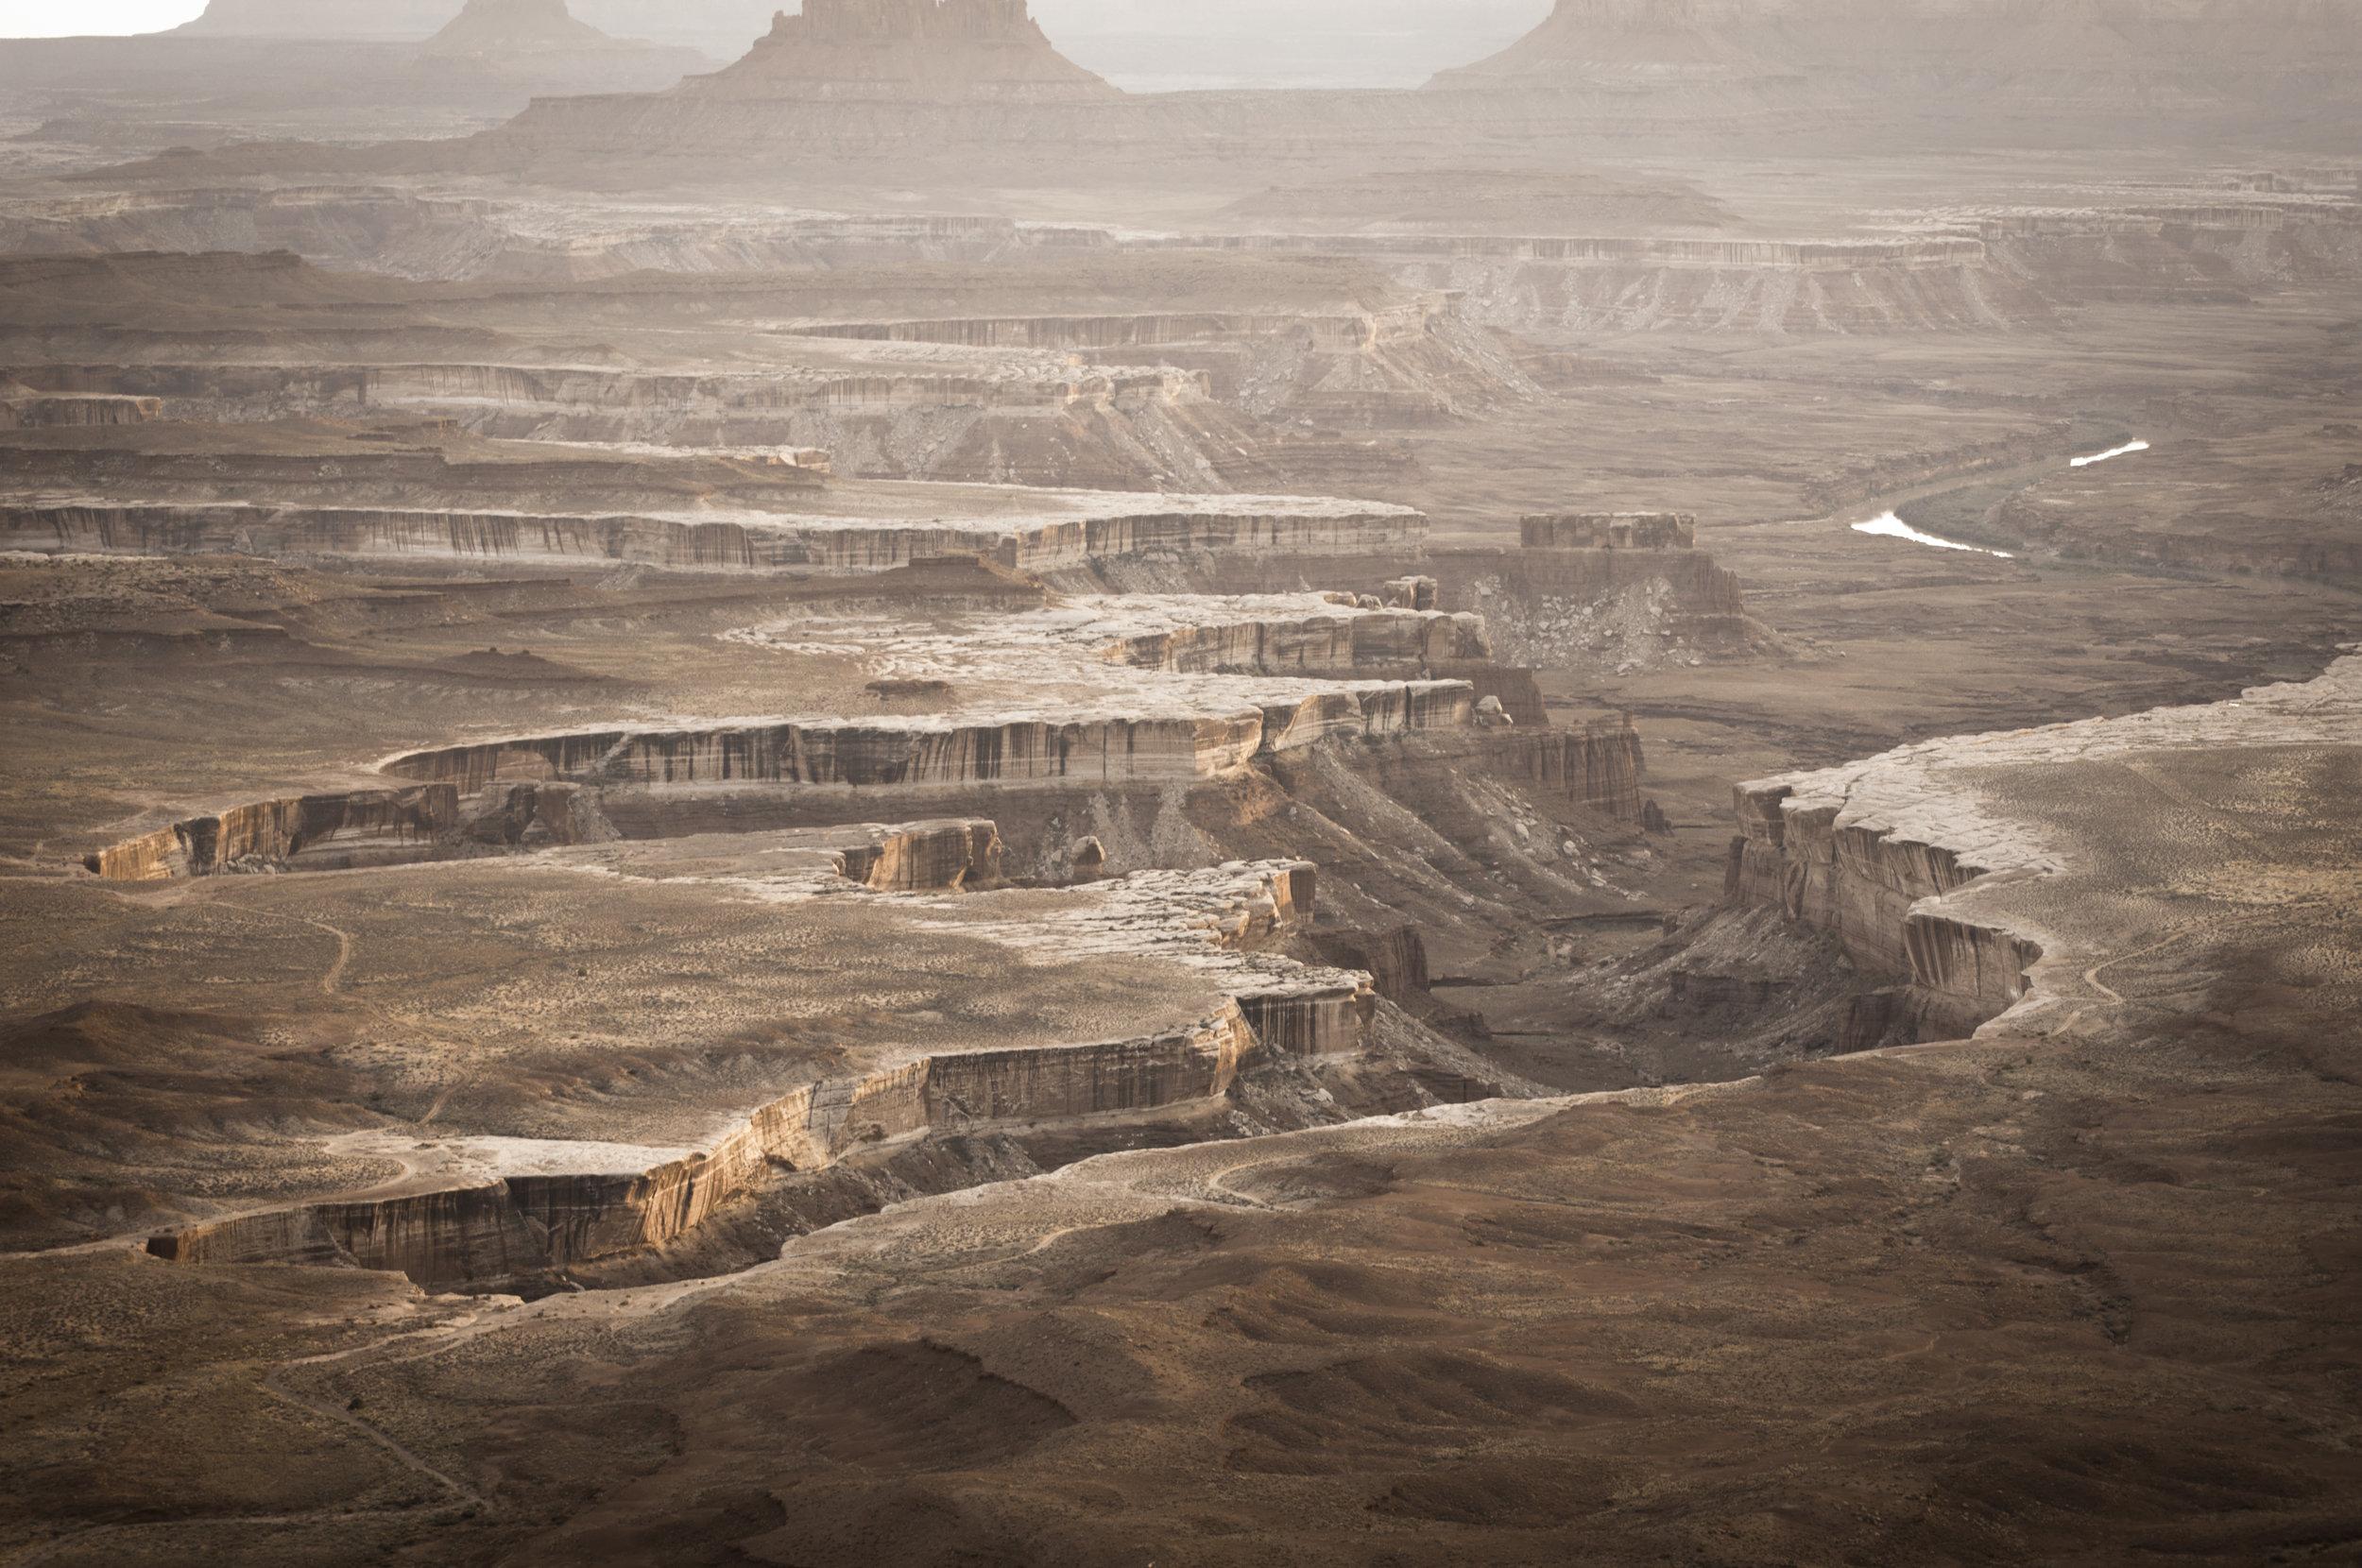 140914. CanyonlandsNP (166).jpg